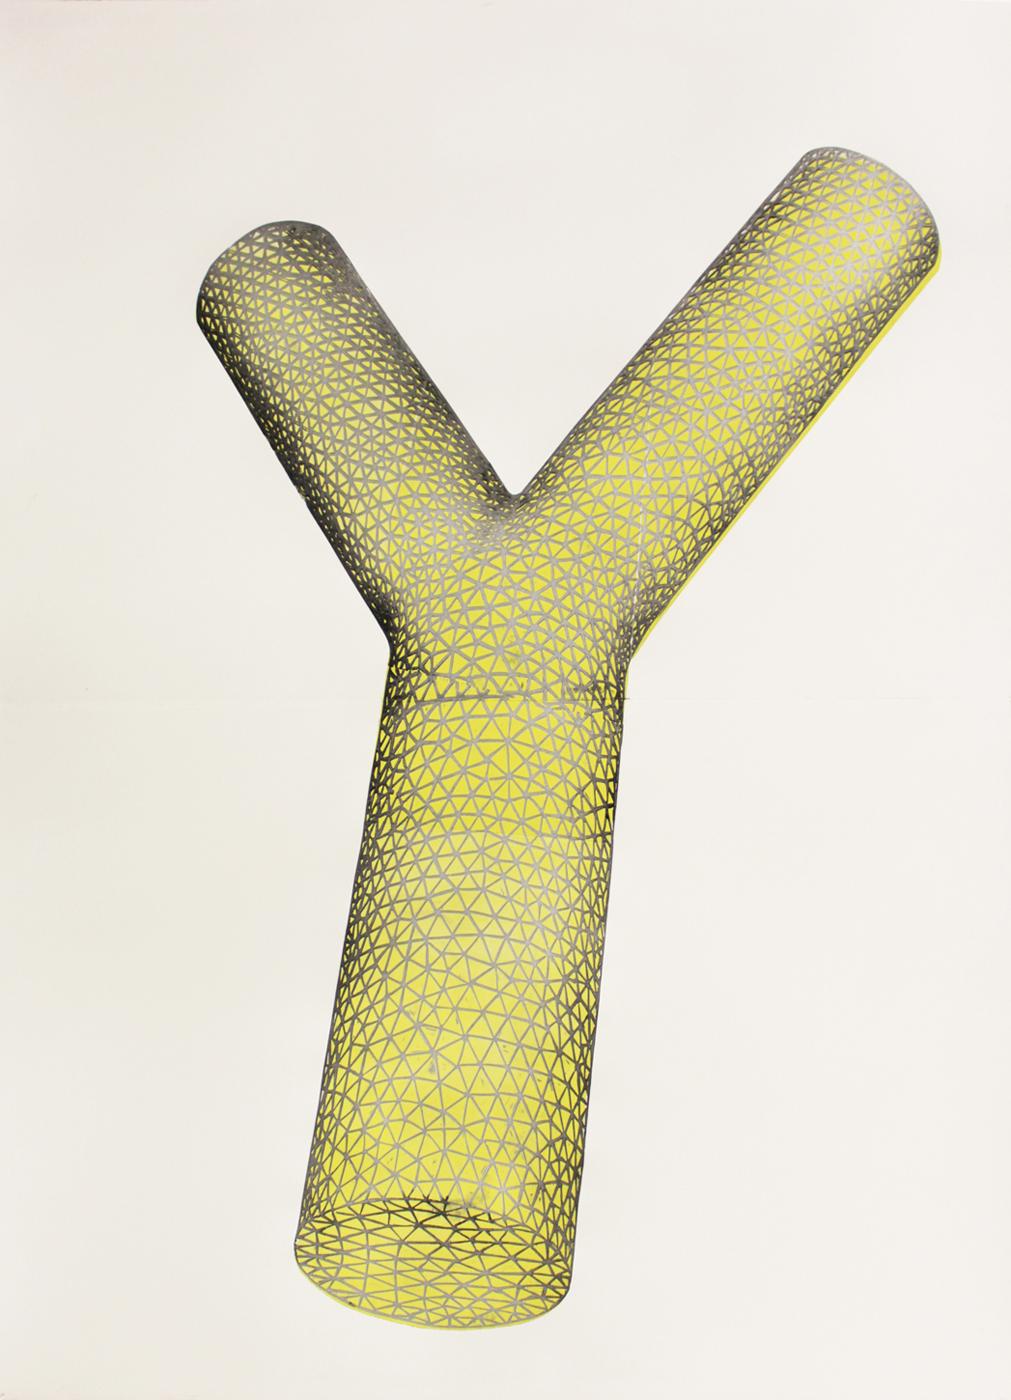 FIGURATIONS XVI linocut_lemon